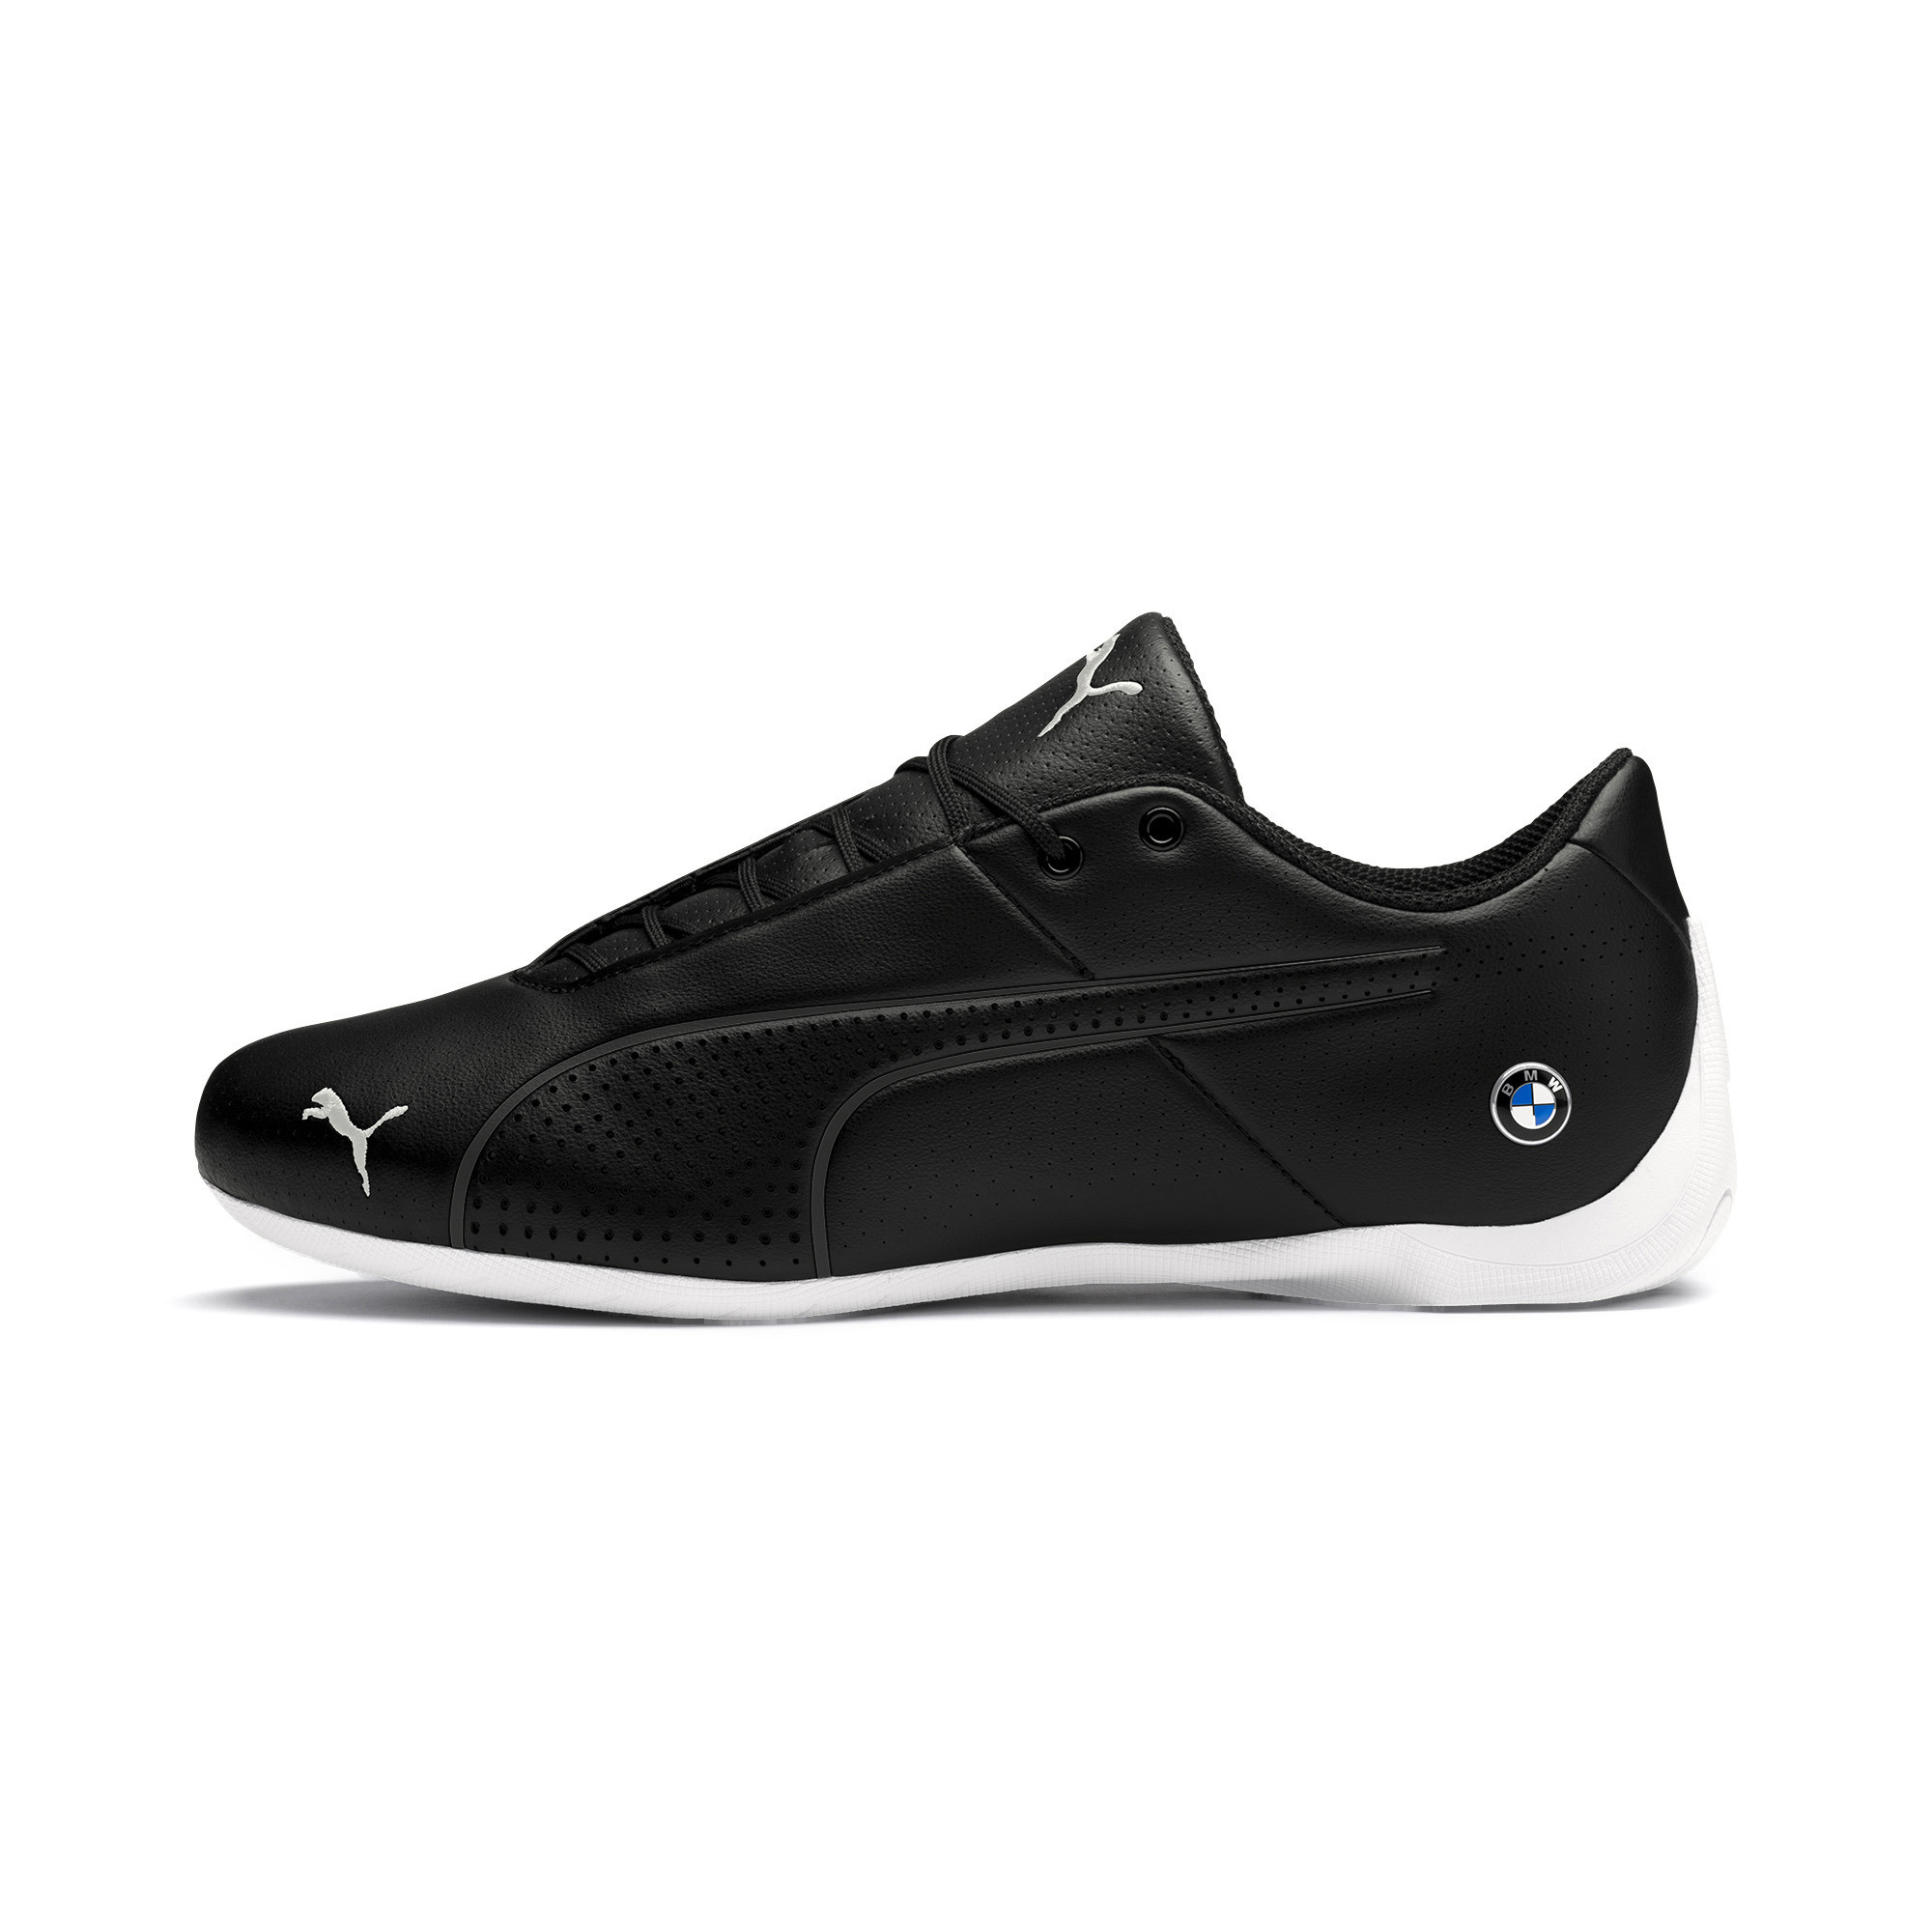 Indexbild 19 - PUMA BMW M Motorsport Future Cat Ultra Sneaker Unisex Schuhe Neu